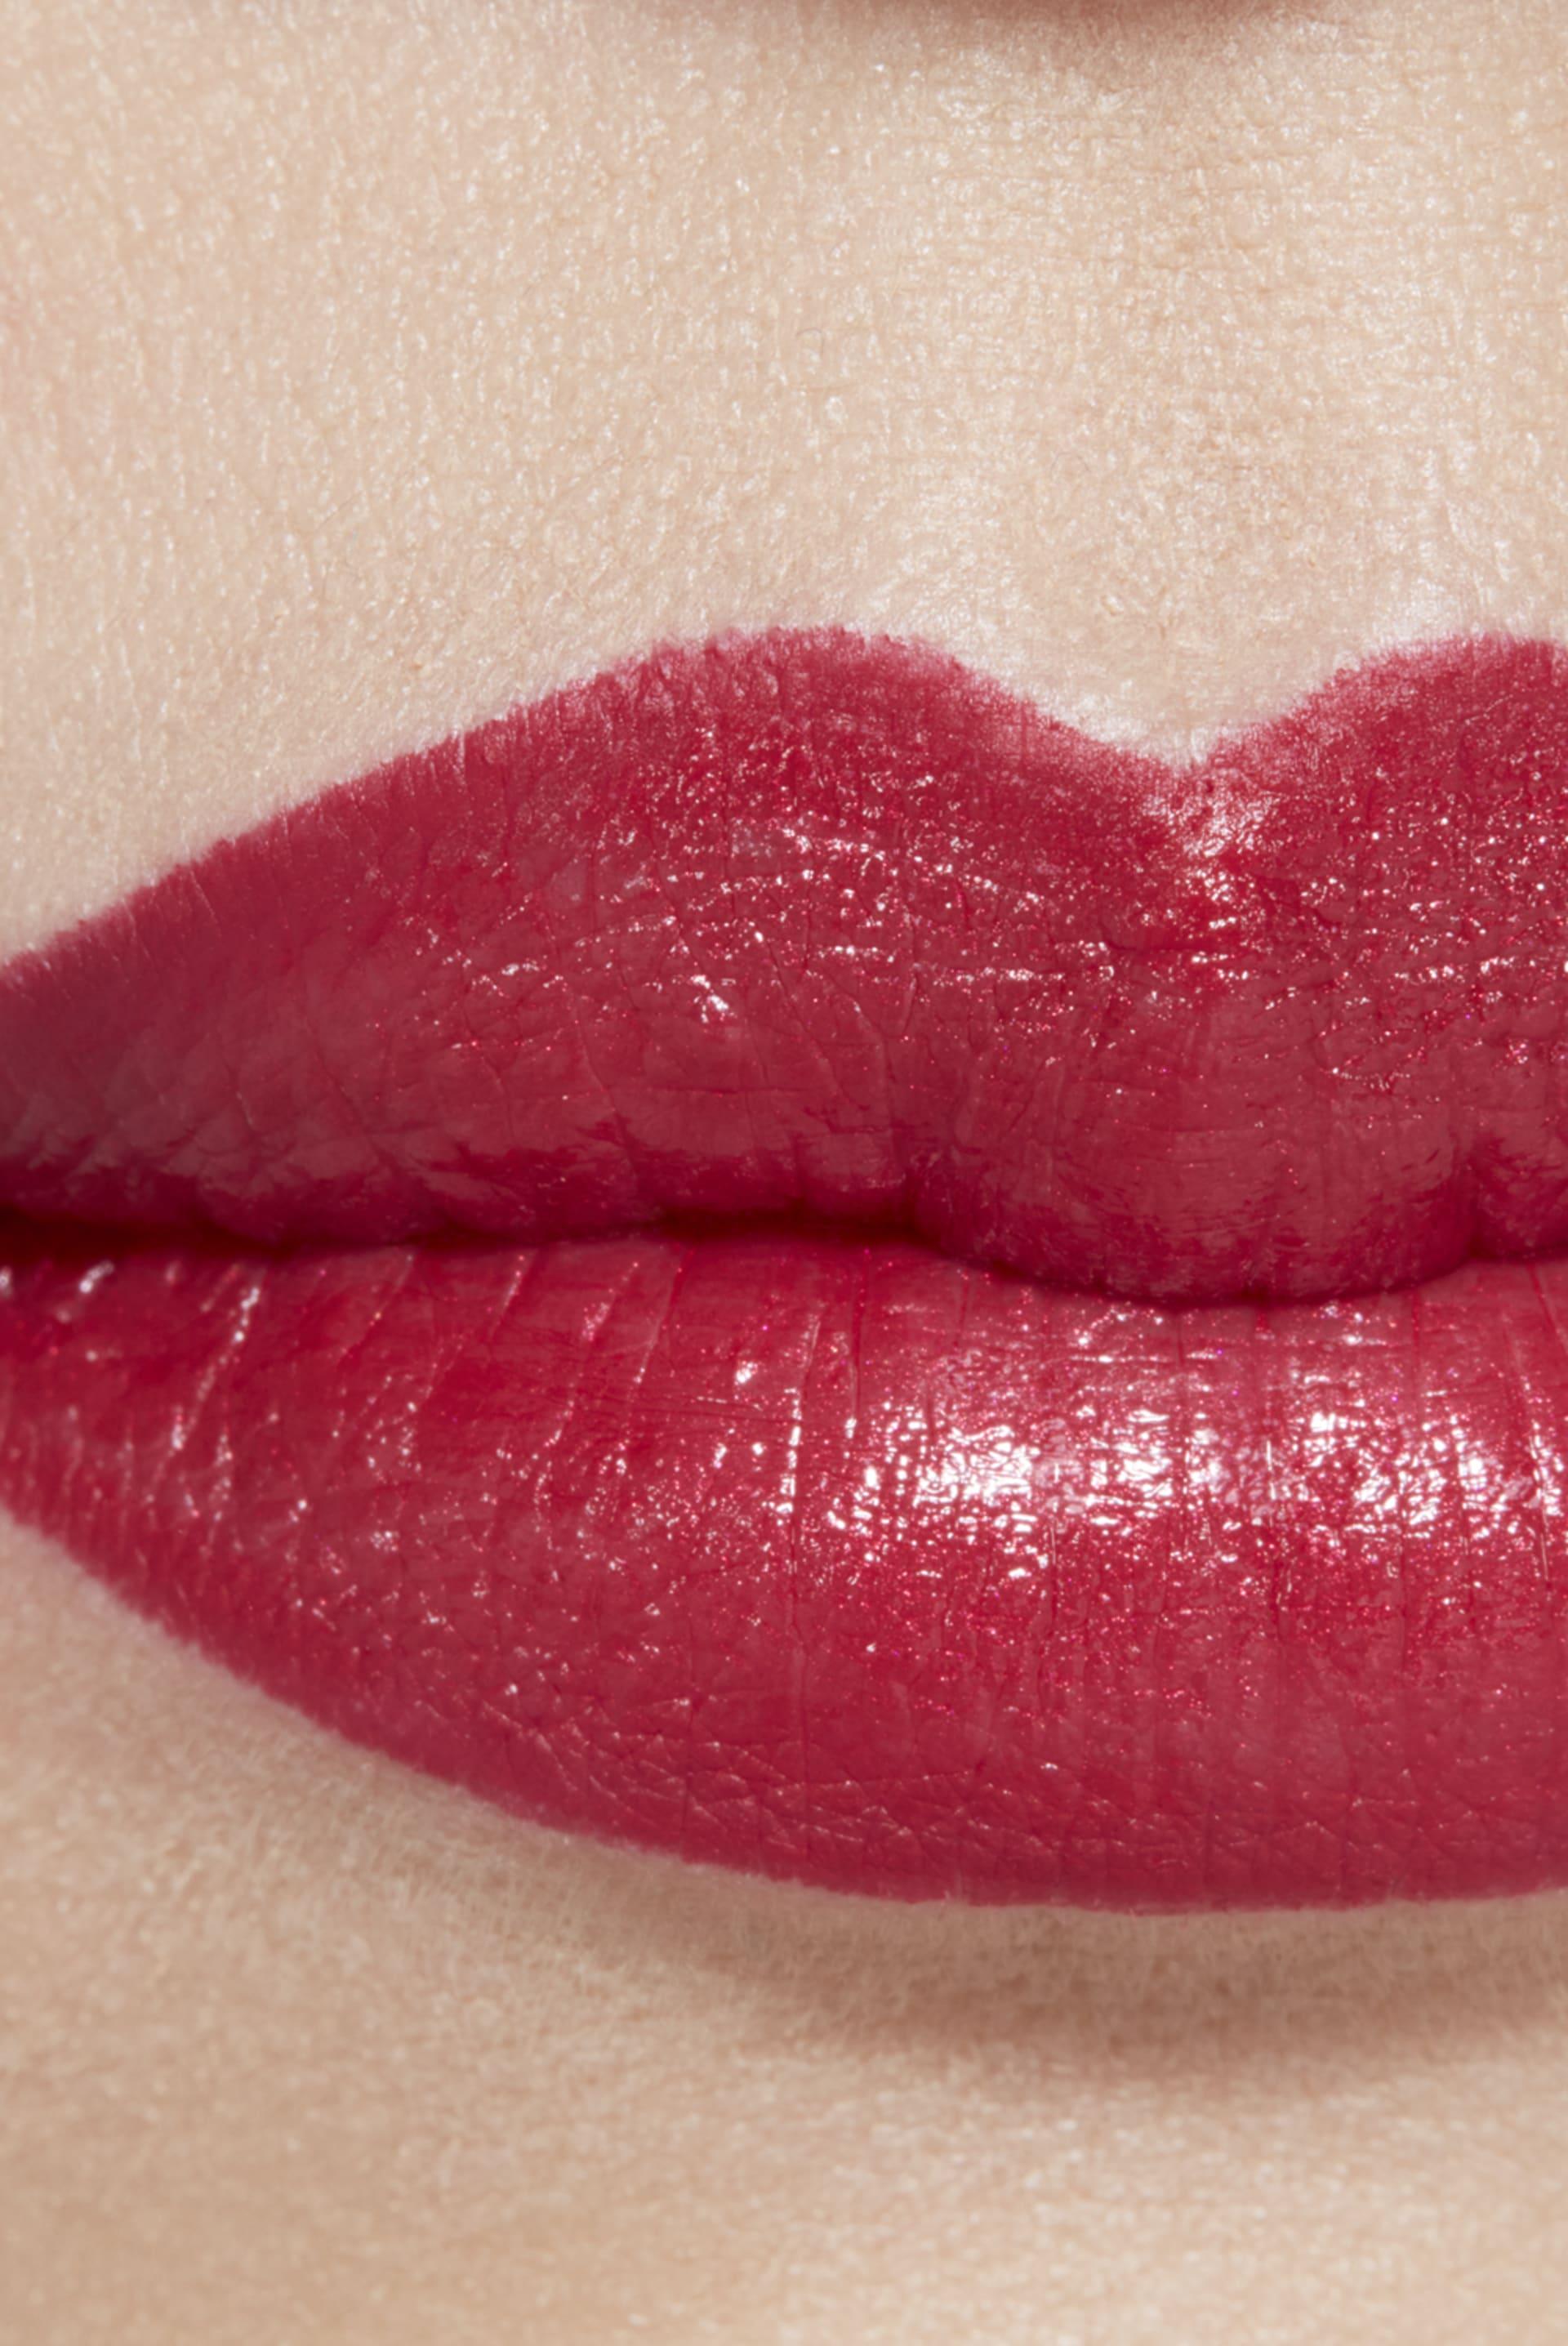 Application makeup visual 1 - ROUGE ALLURE CAMÉLIA 607 - ROUGE ALLURE CAMÉLIA ROUGE MÉTAL